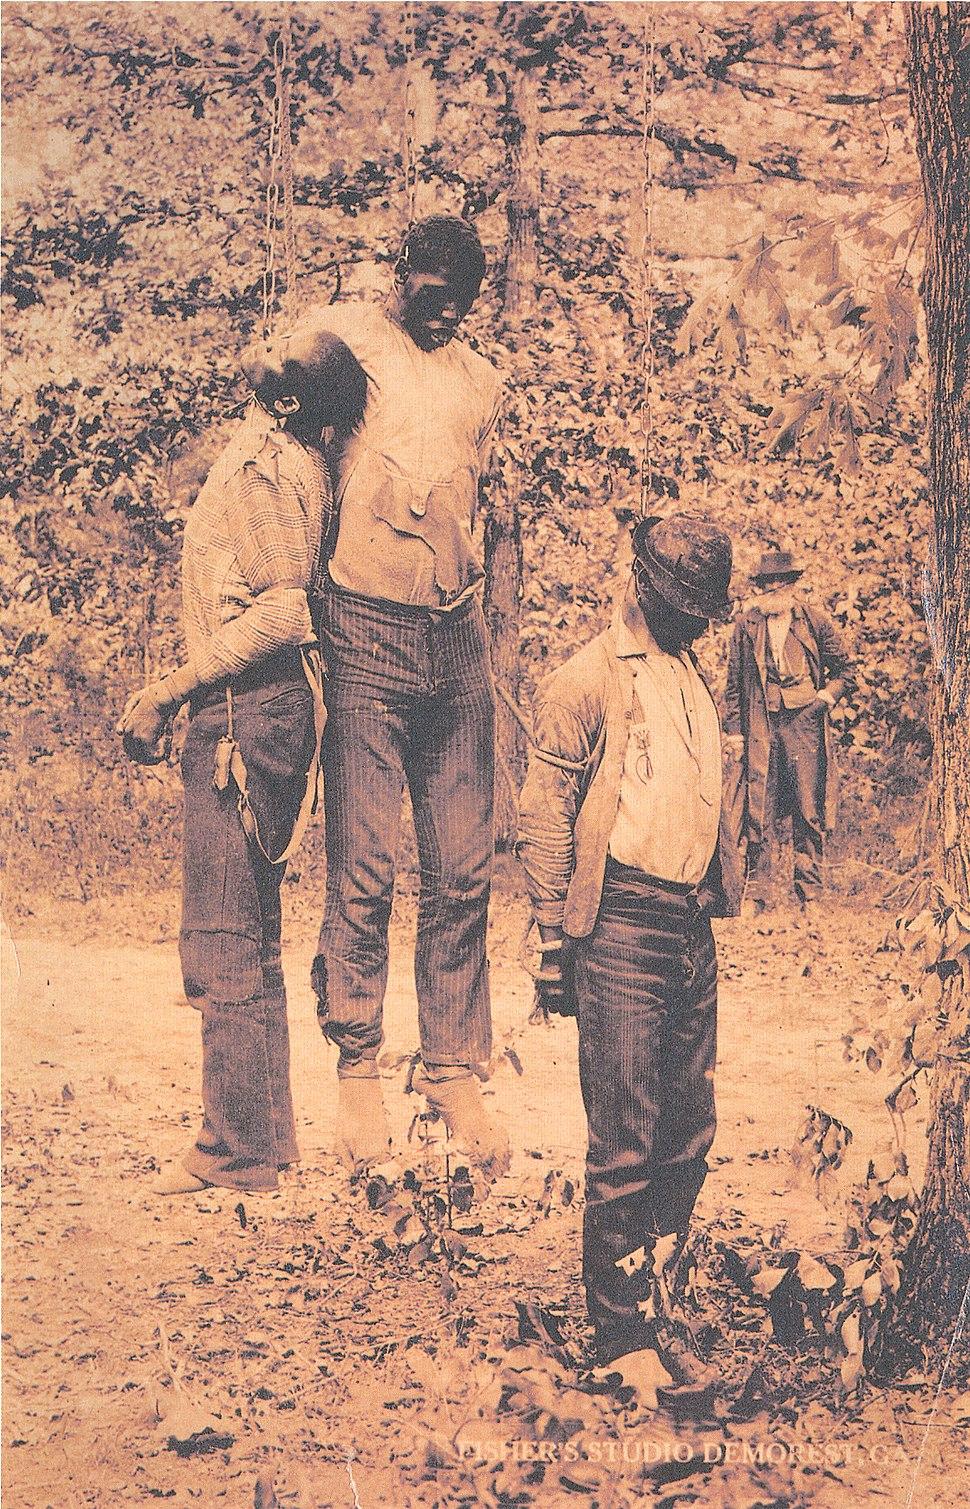 Lynching of Redmond, Roberson and Addison